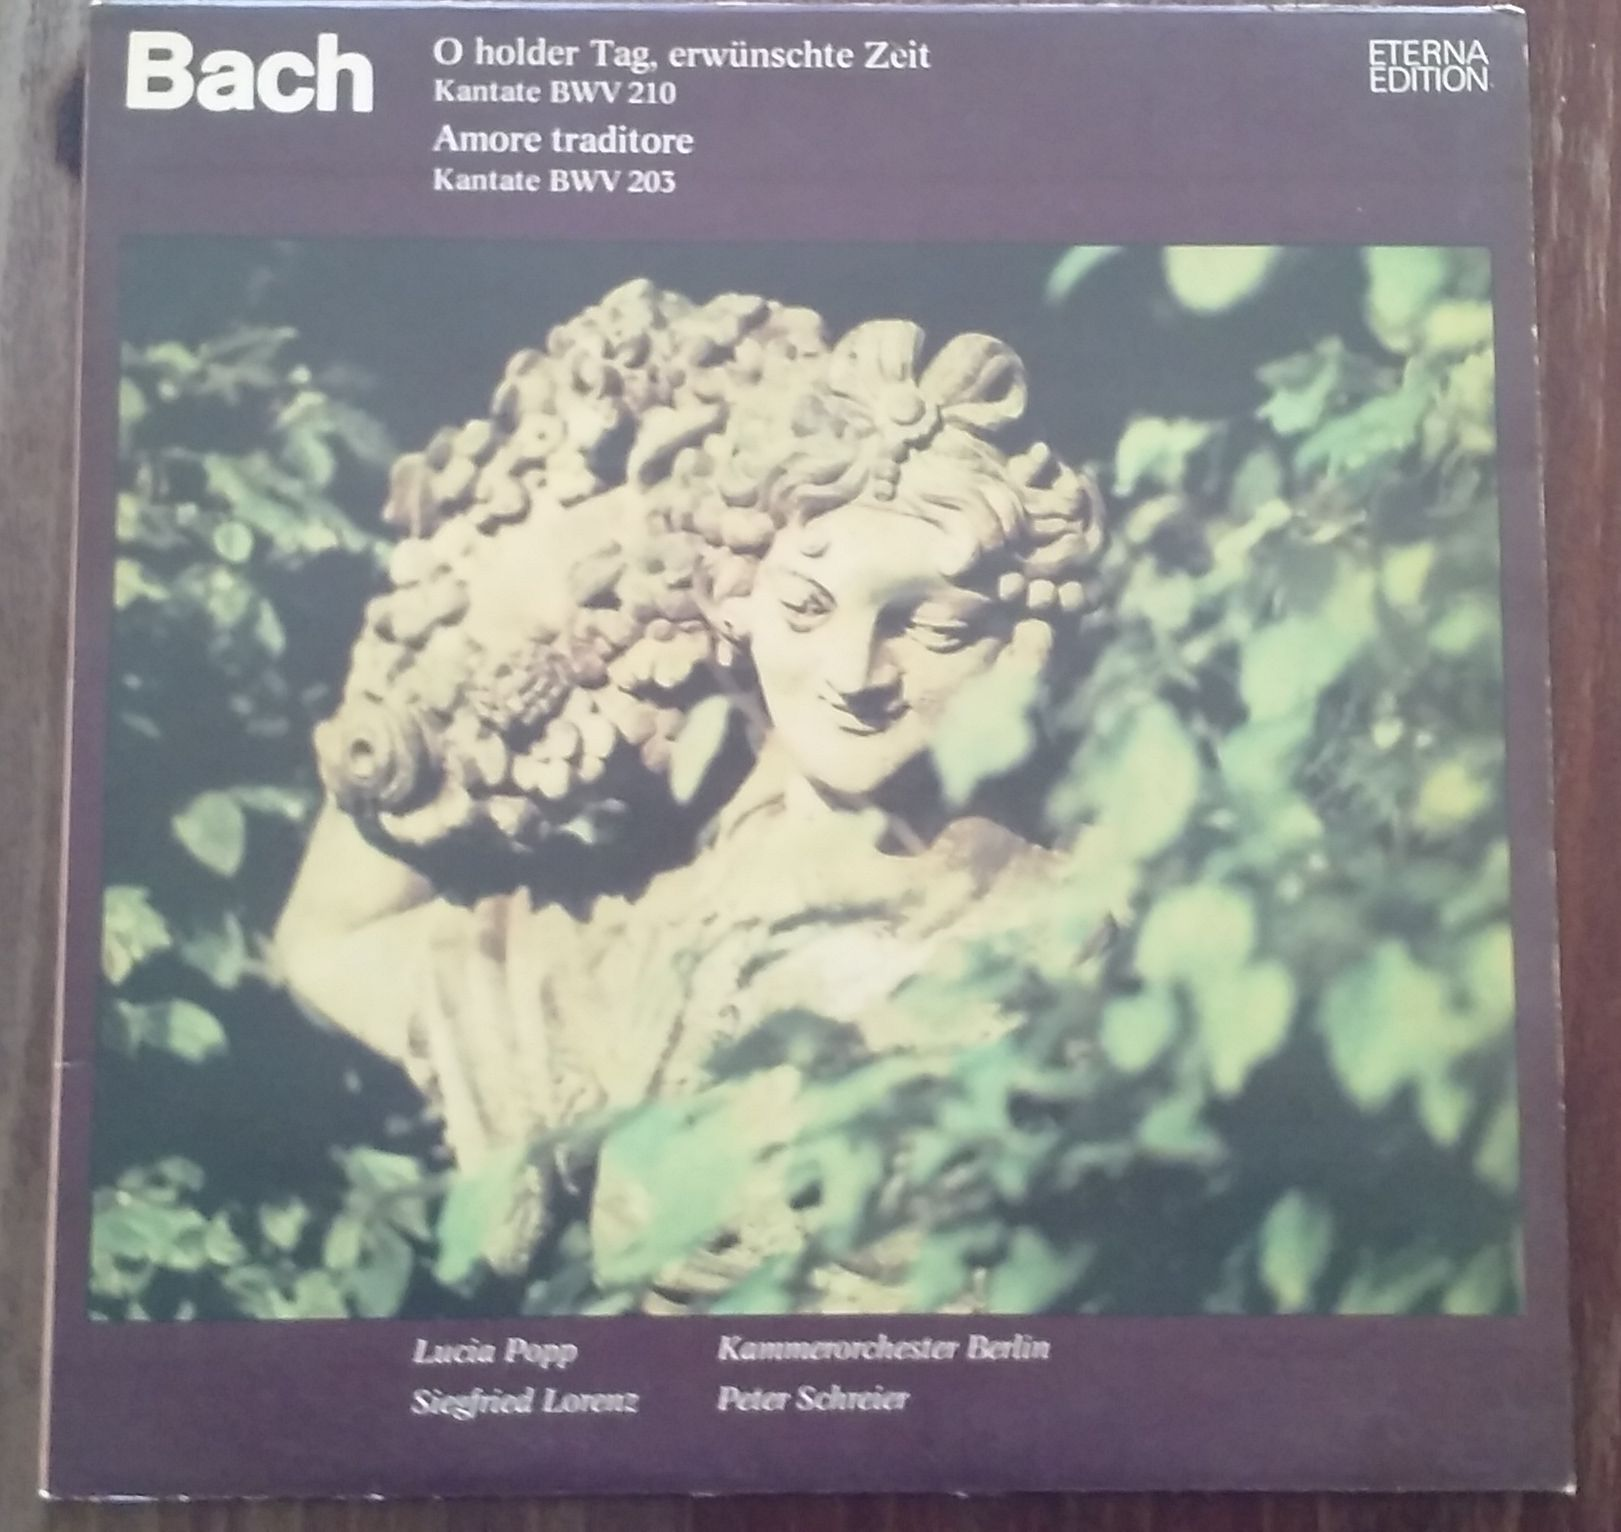 Bach - O holder Tag, erwünschte Zeit - Kantate BWV 210 (LP, gramodeska)